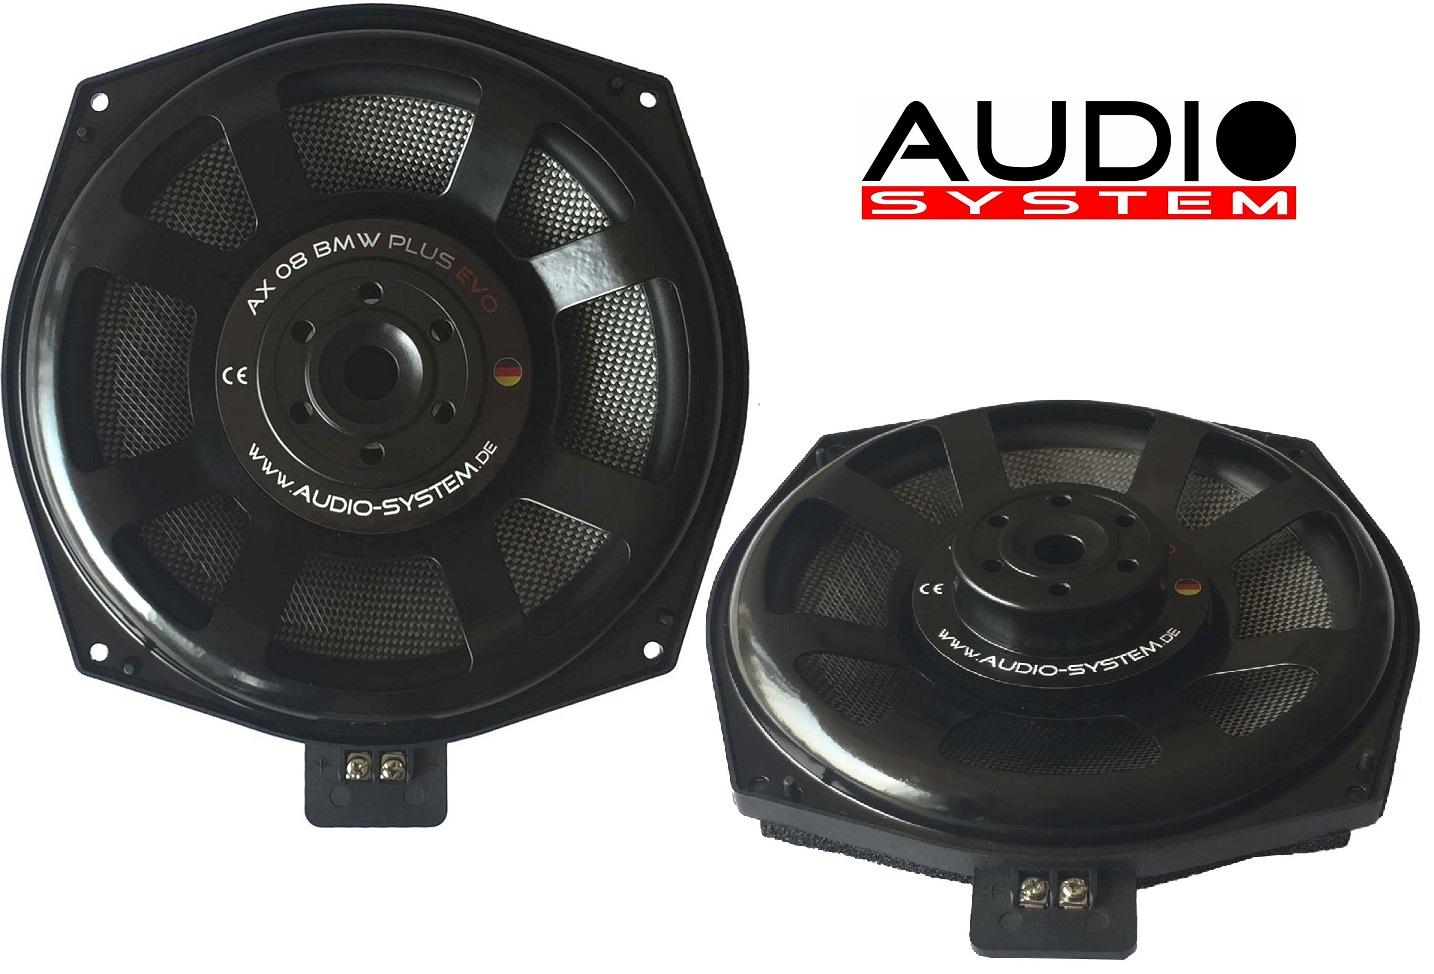 Audio System AX 08 BMW PLUS EVO Subwoofer 20cm BMW E und F BMW Modelle 1 Paar